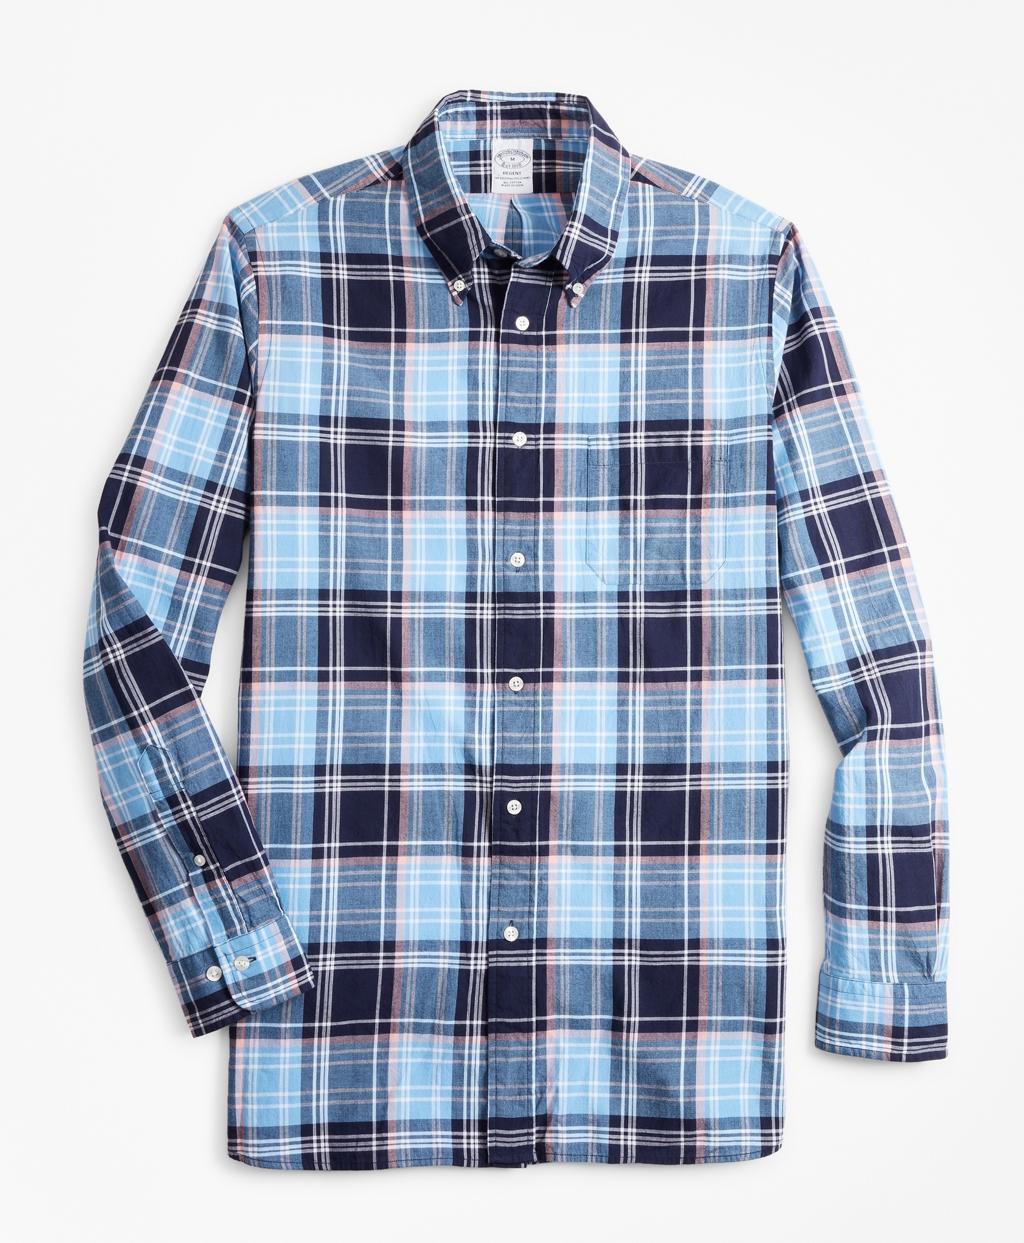 Mens Vintage Shirts – Retro Shirts Brooks Brothers Mens Slim Fit Blue Madras Sport Shirt $39.75 AT vintagedancer.com